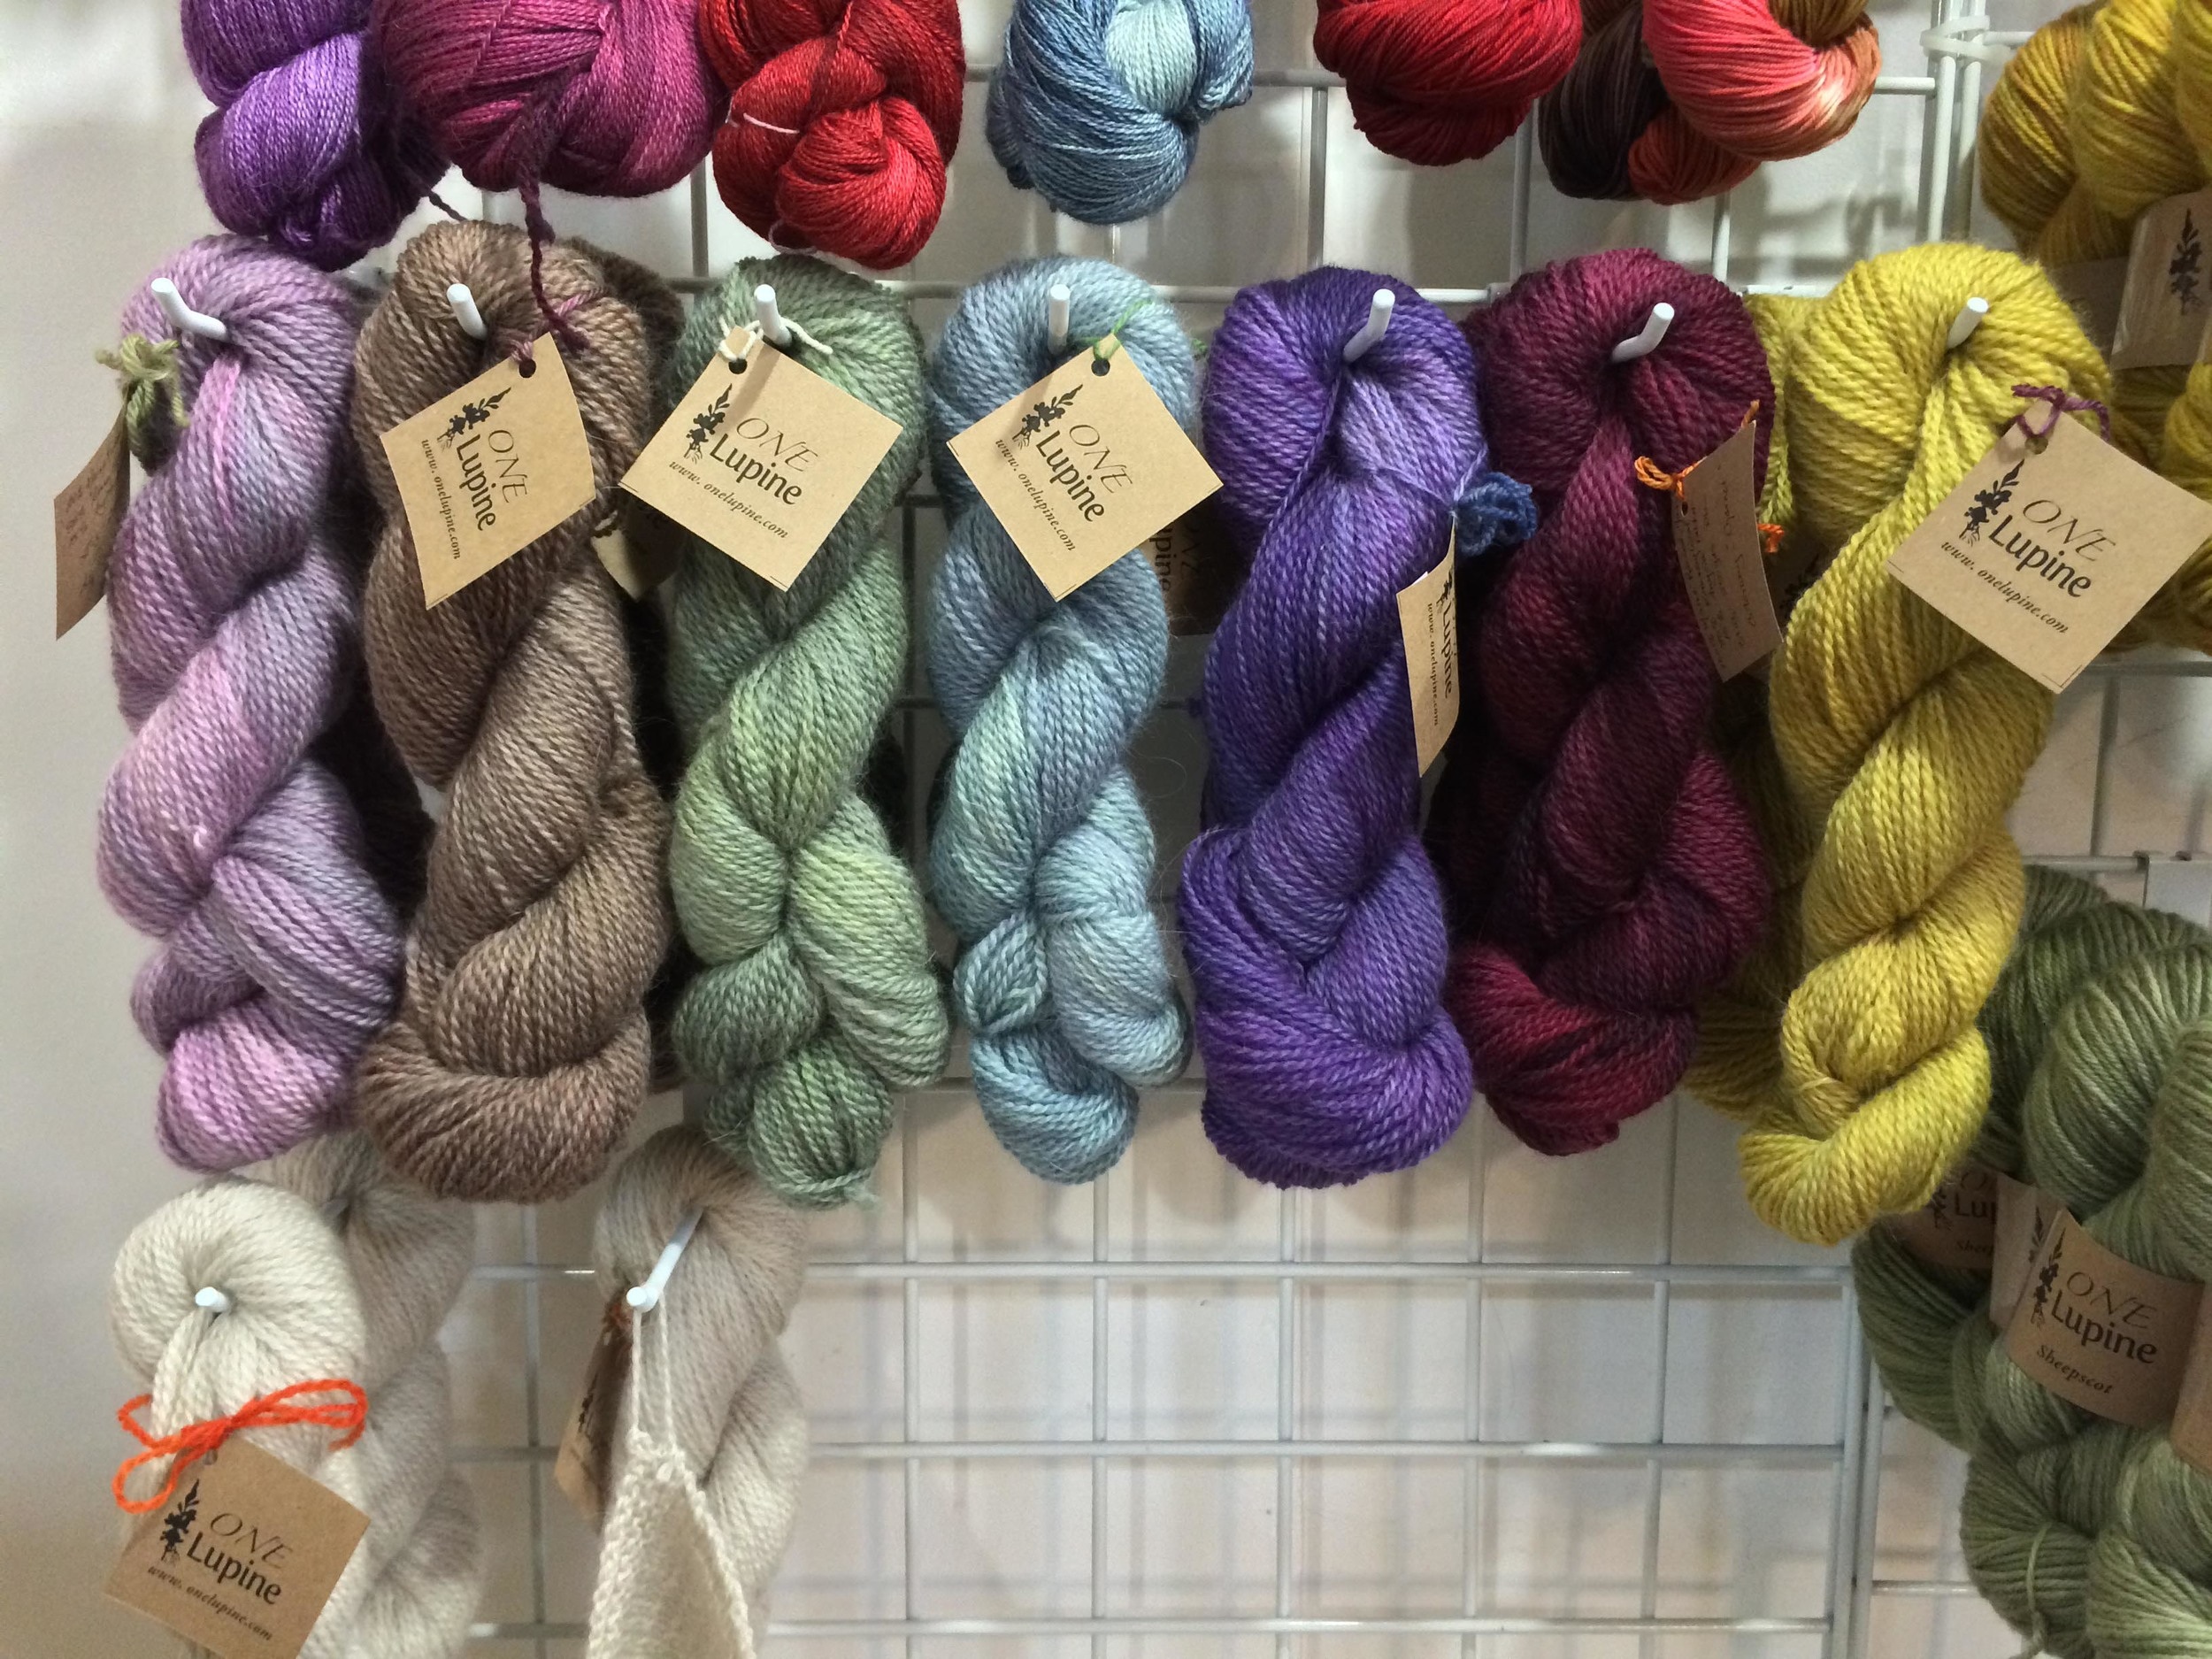 Maine Yarn & Fiber Supply, Maxine